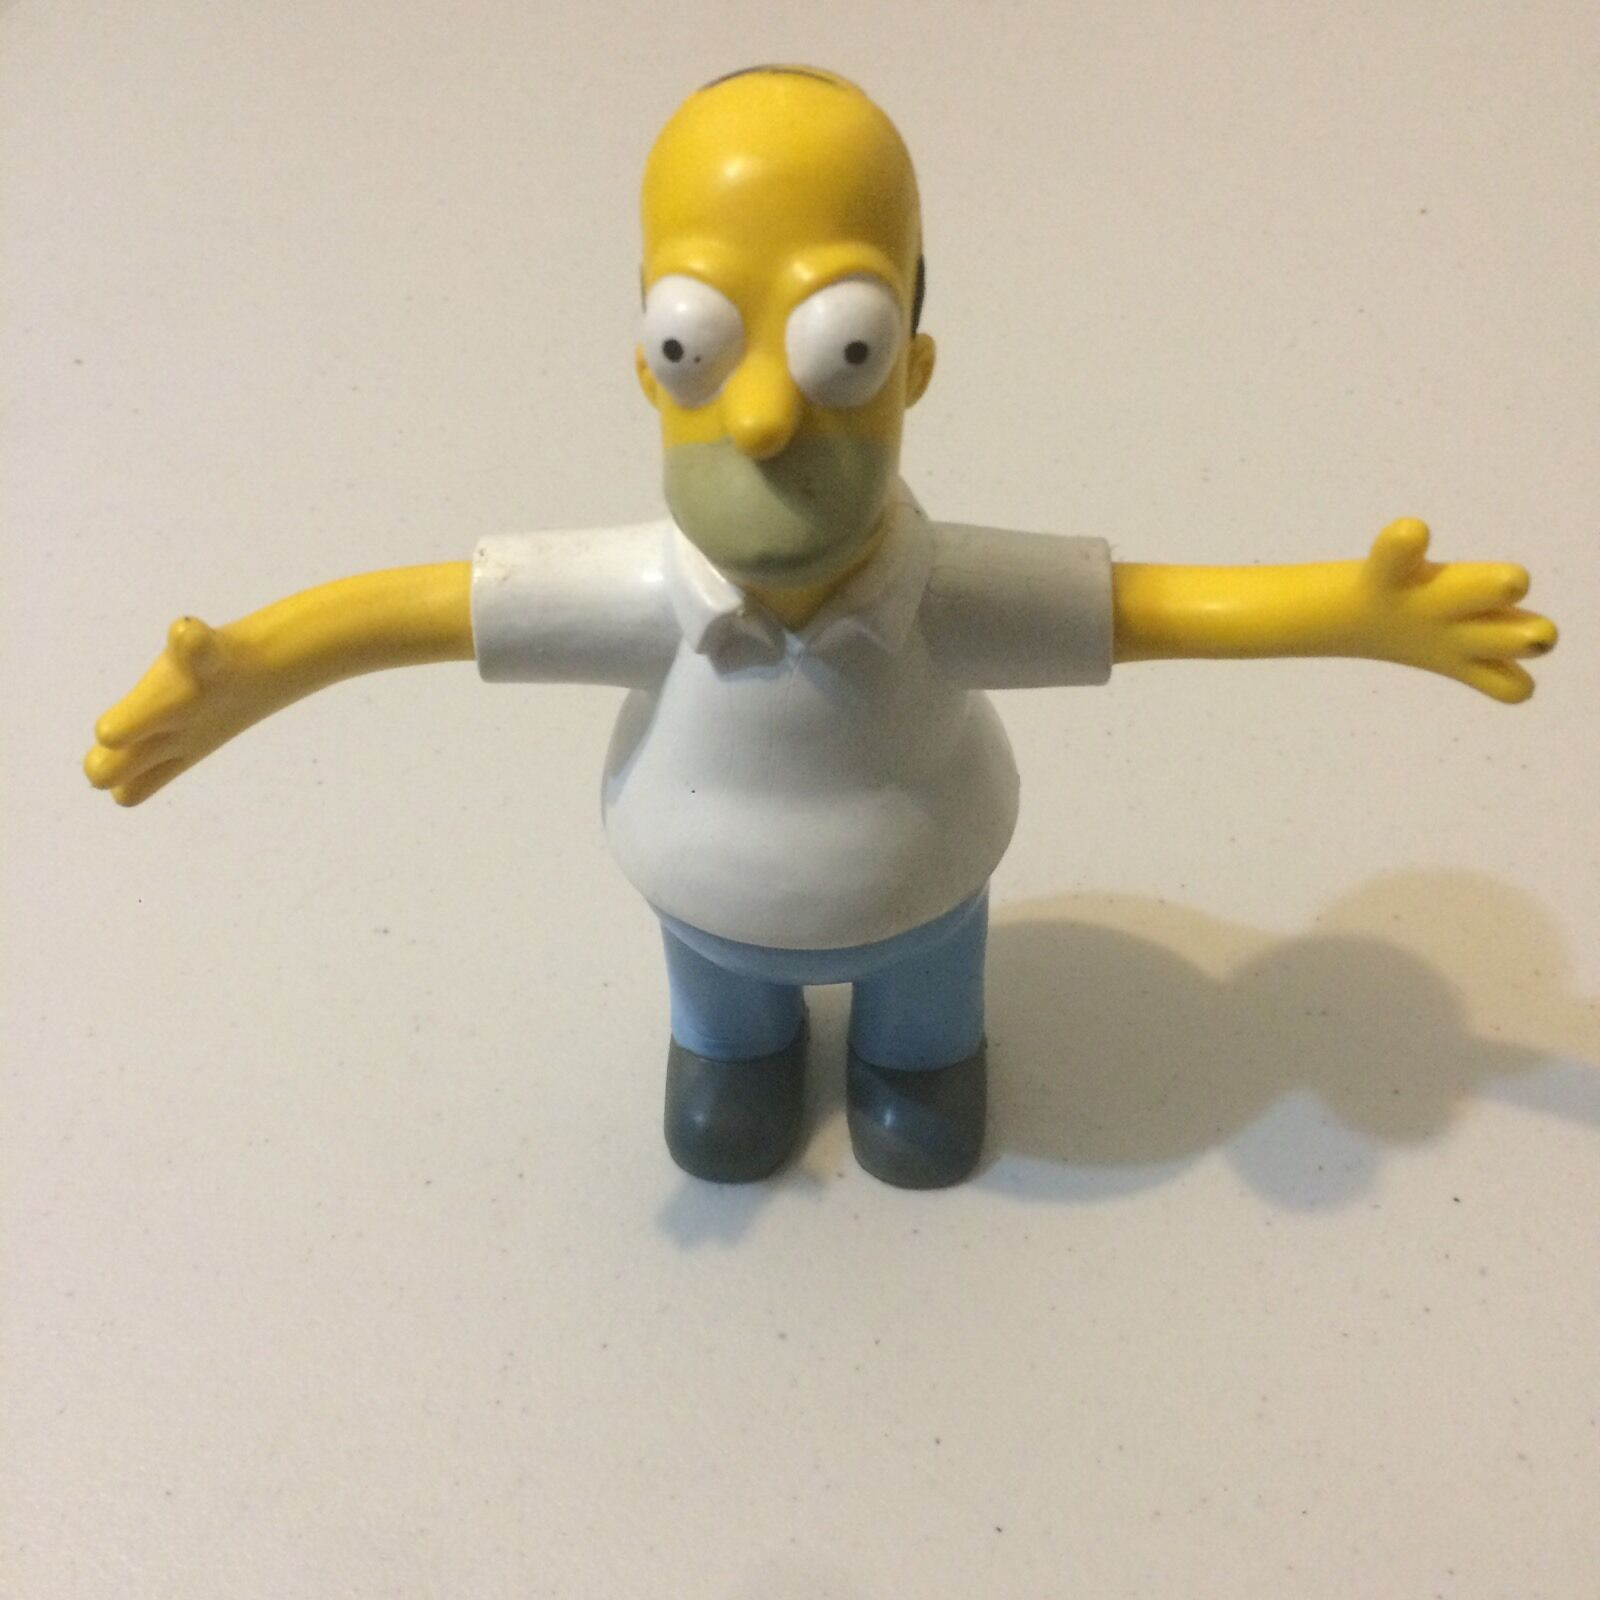 Homer Simpson - 1990 Rare Rare Rare Hard Rubber Doll - 16cms The Simpsons a1ff58